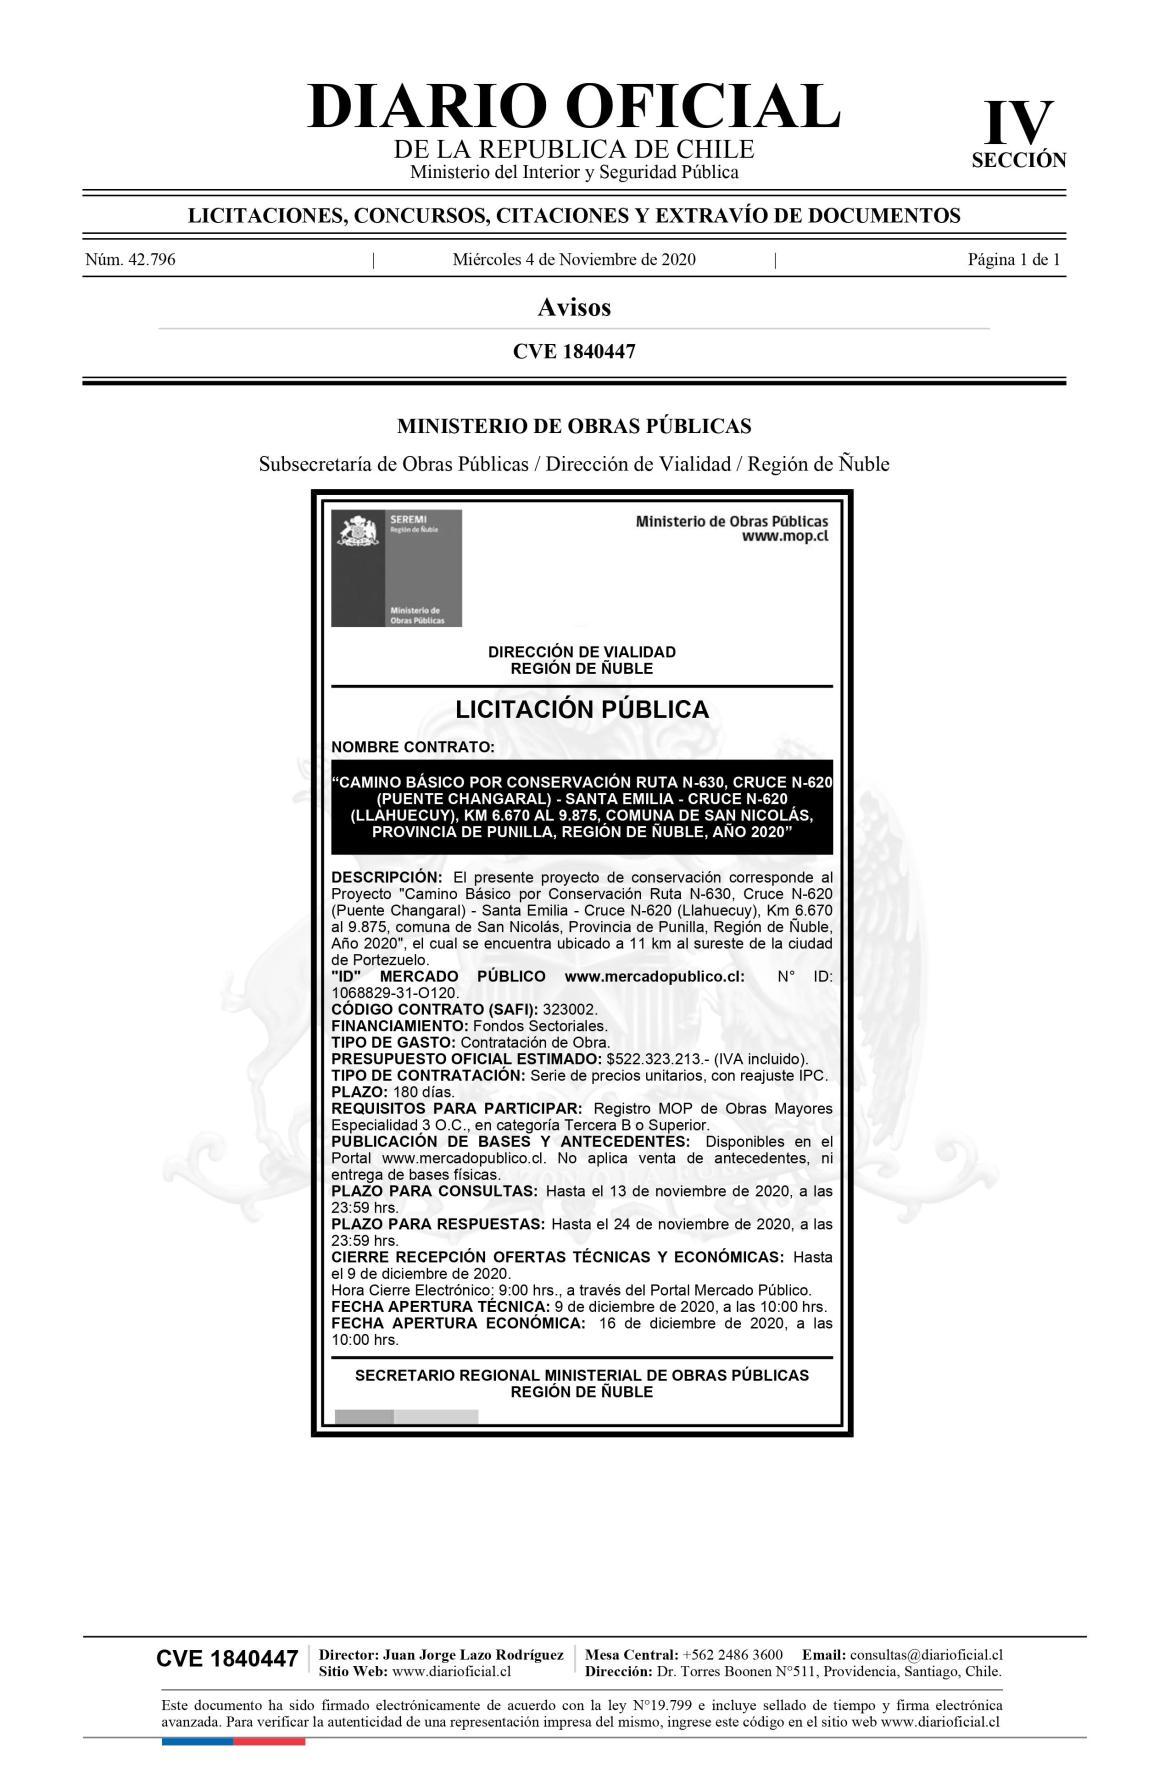 Diario-Oficial-apertura-licitaci-n-3-2-San-Nicol-s